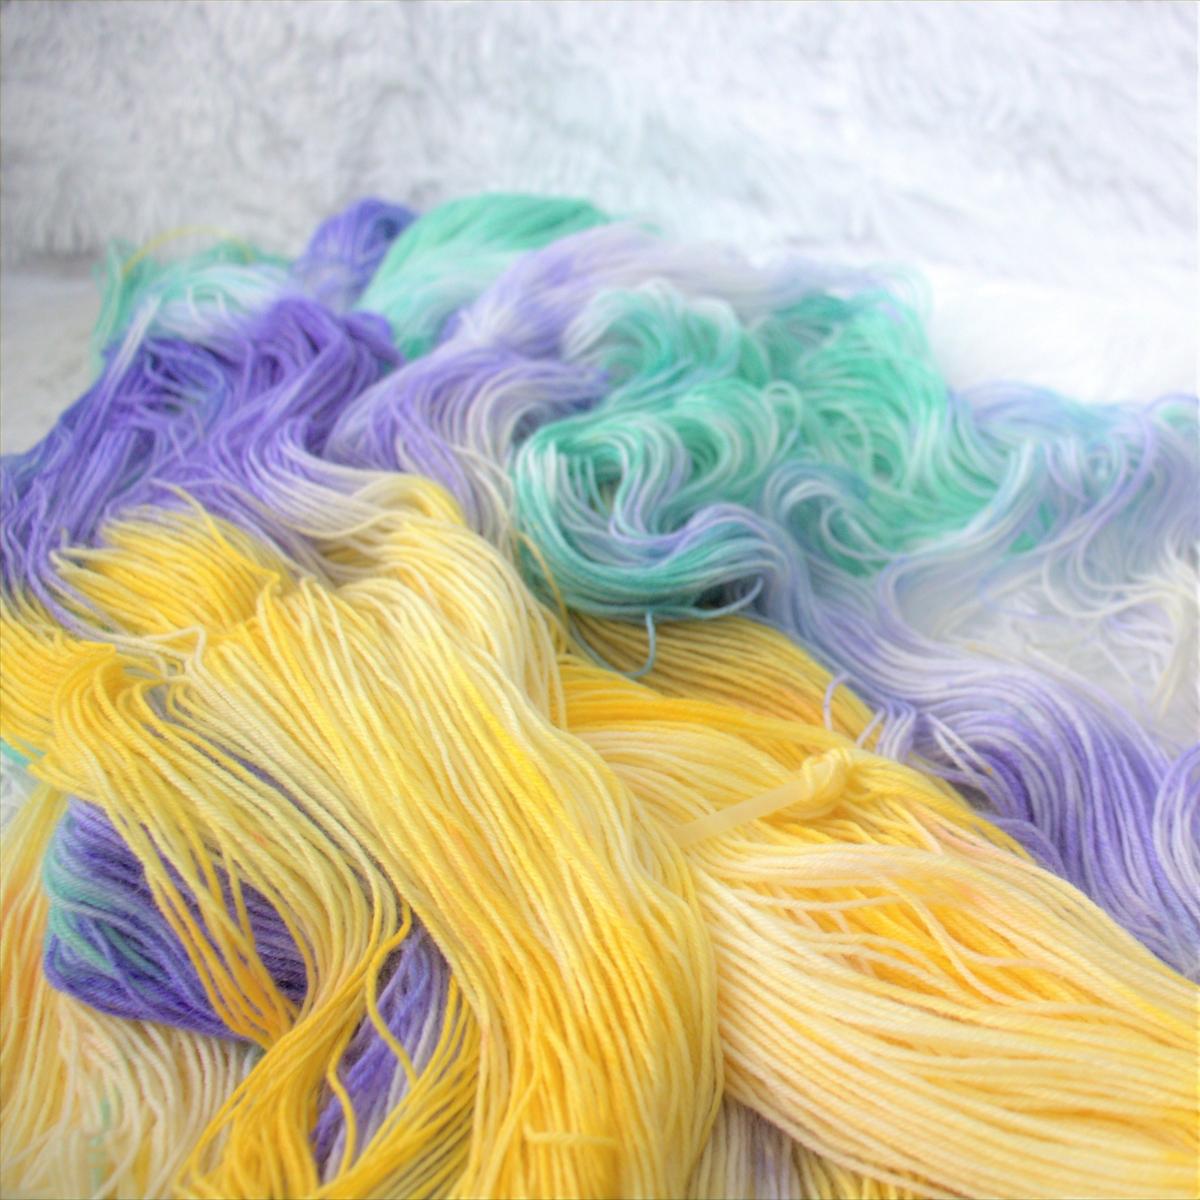 woodico.pro hand dyed yarn 045 copy 1200x1200 - Hand dyed yarn / 046